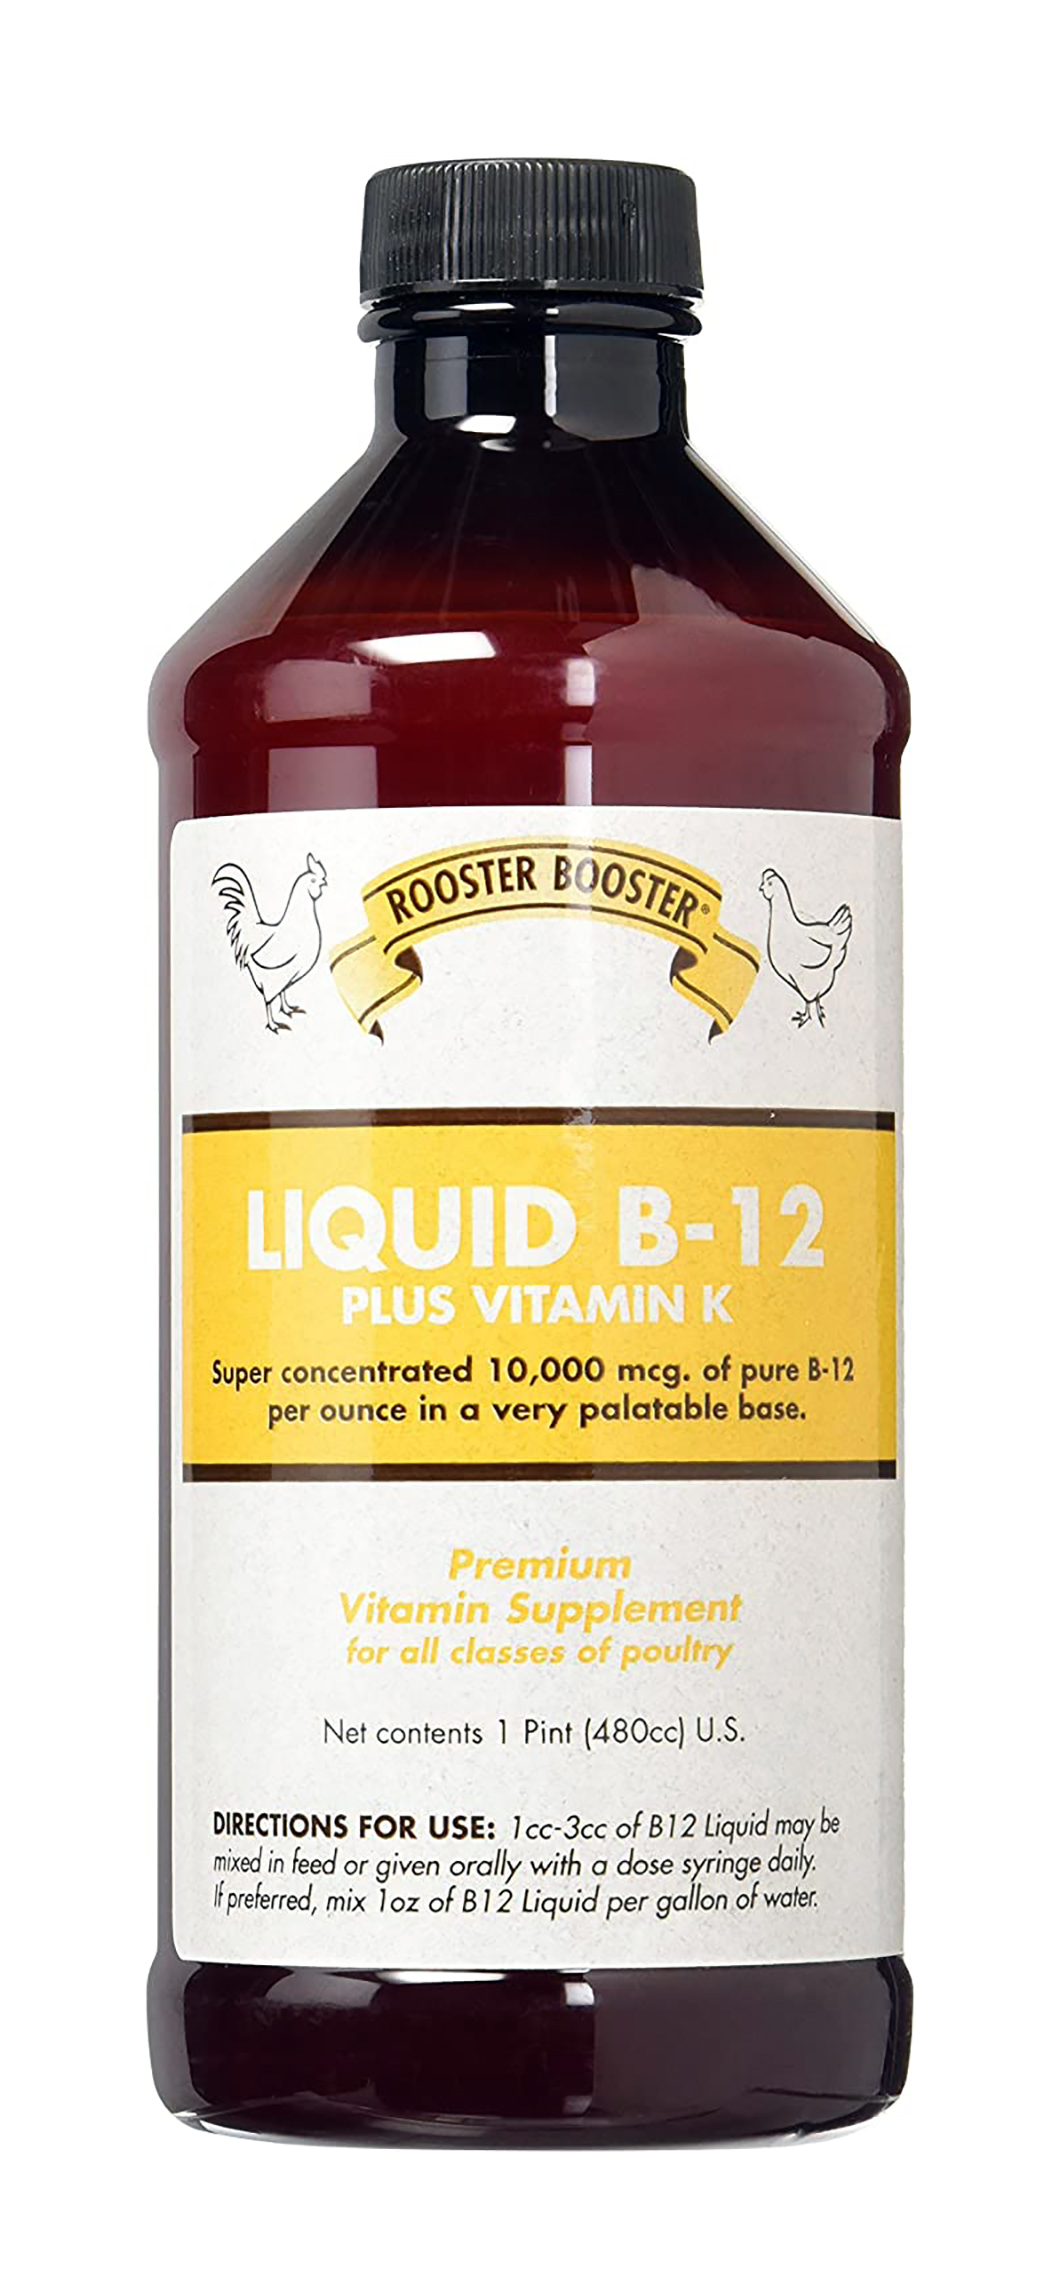 B-12 Liquid review